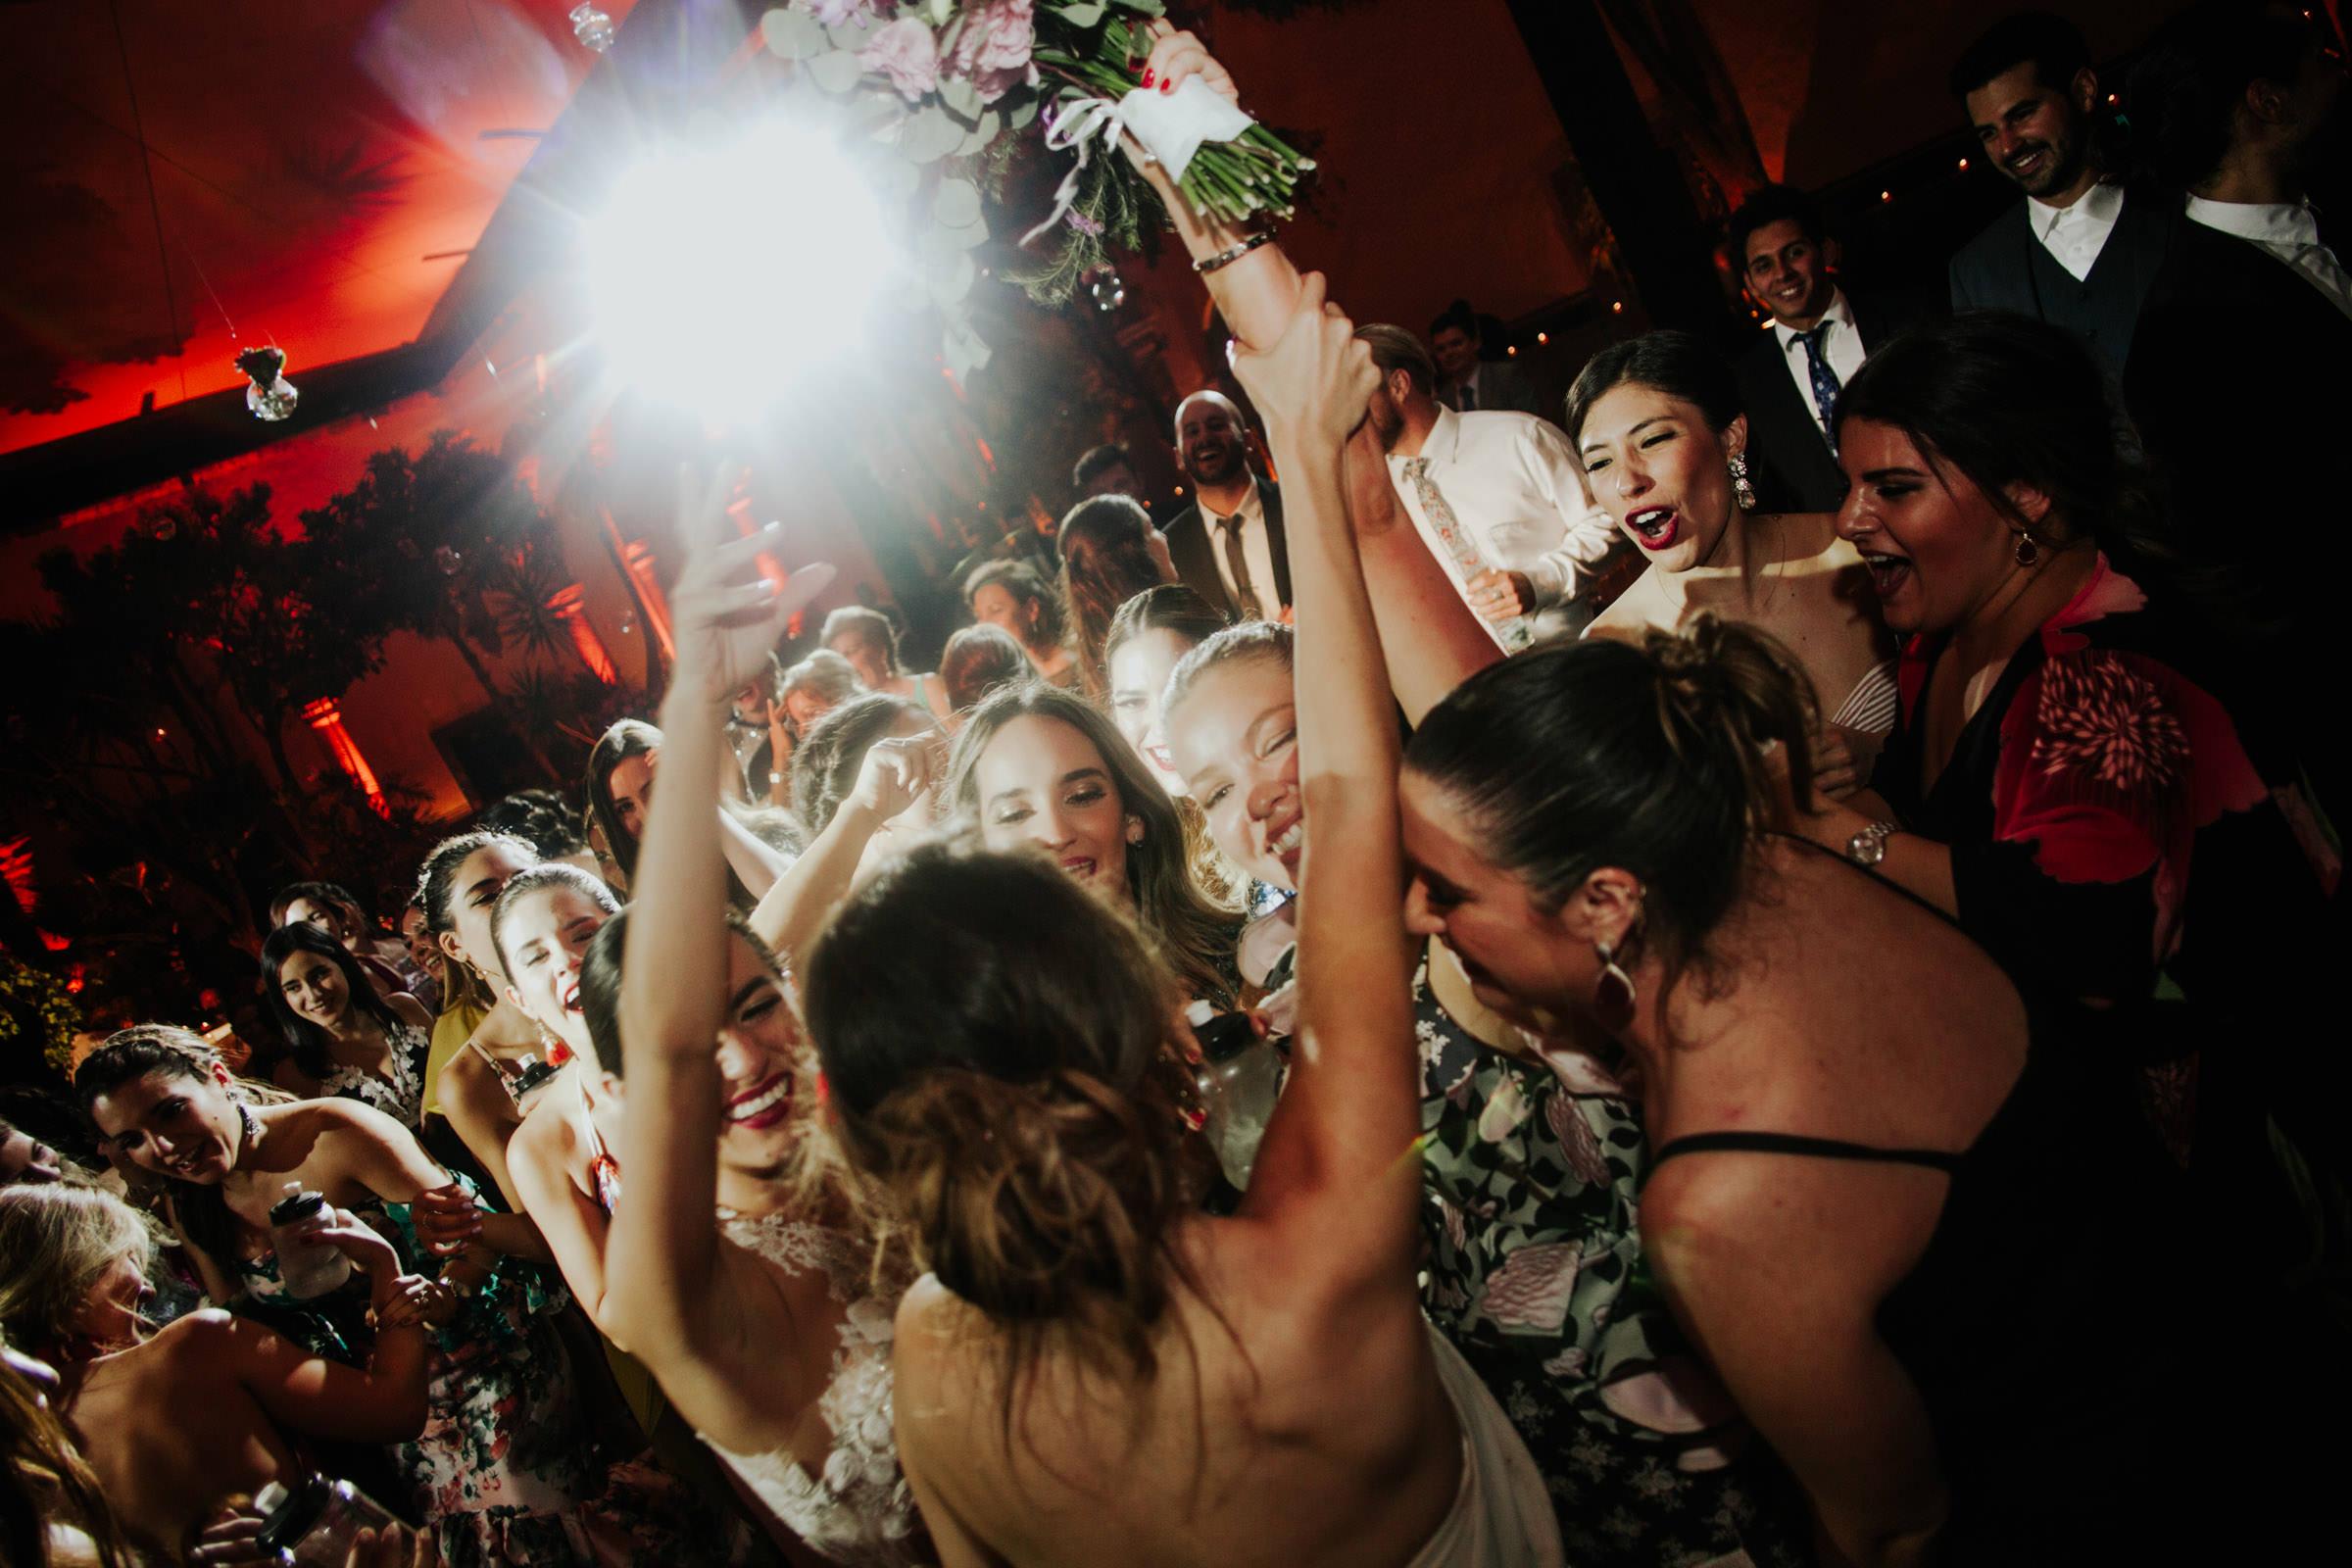 San-Miguel-de-Allende-Wedding-Photography-Parroquia-Instituto-Boda-Fotografia-Fer-Sergio-Pierce-Lifestyle-Photography0081.JPG